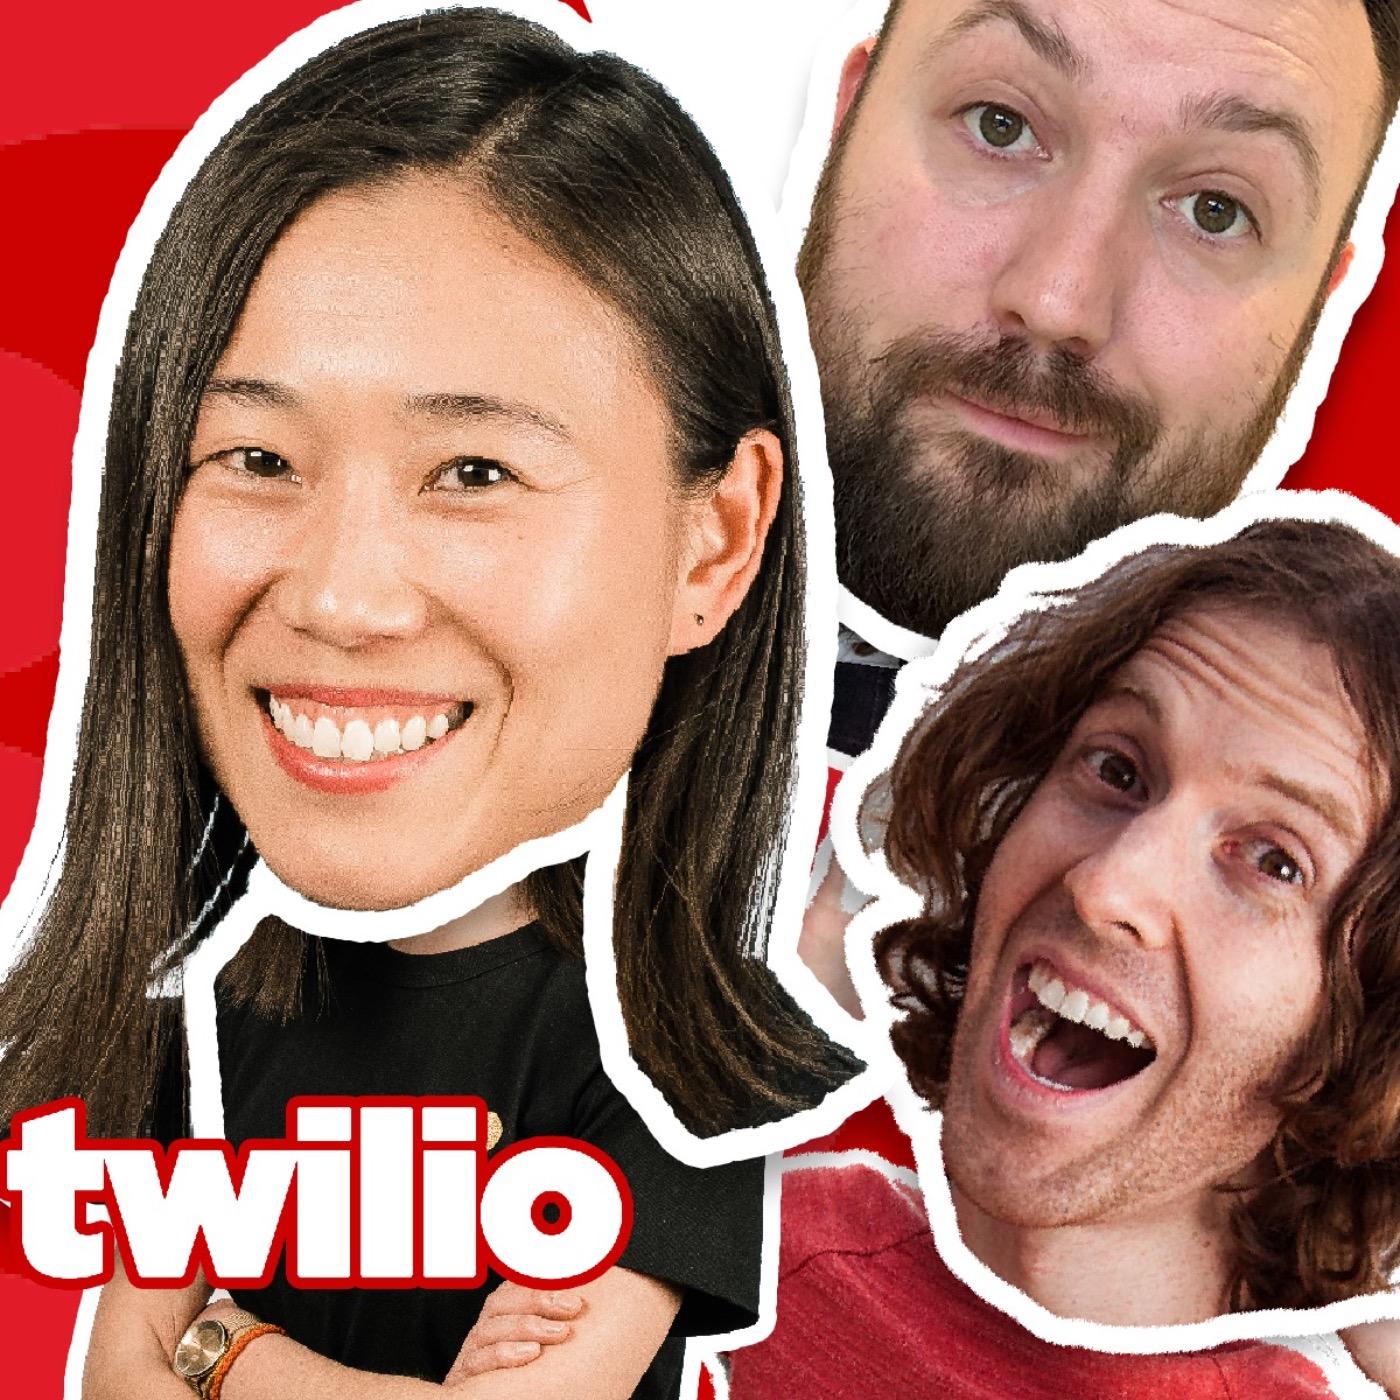 Twilio Autopilot and building trust through dialogue design with Elaine Lee